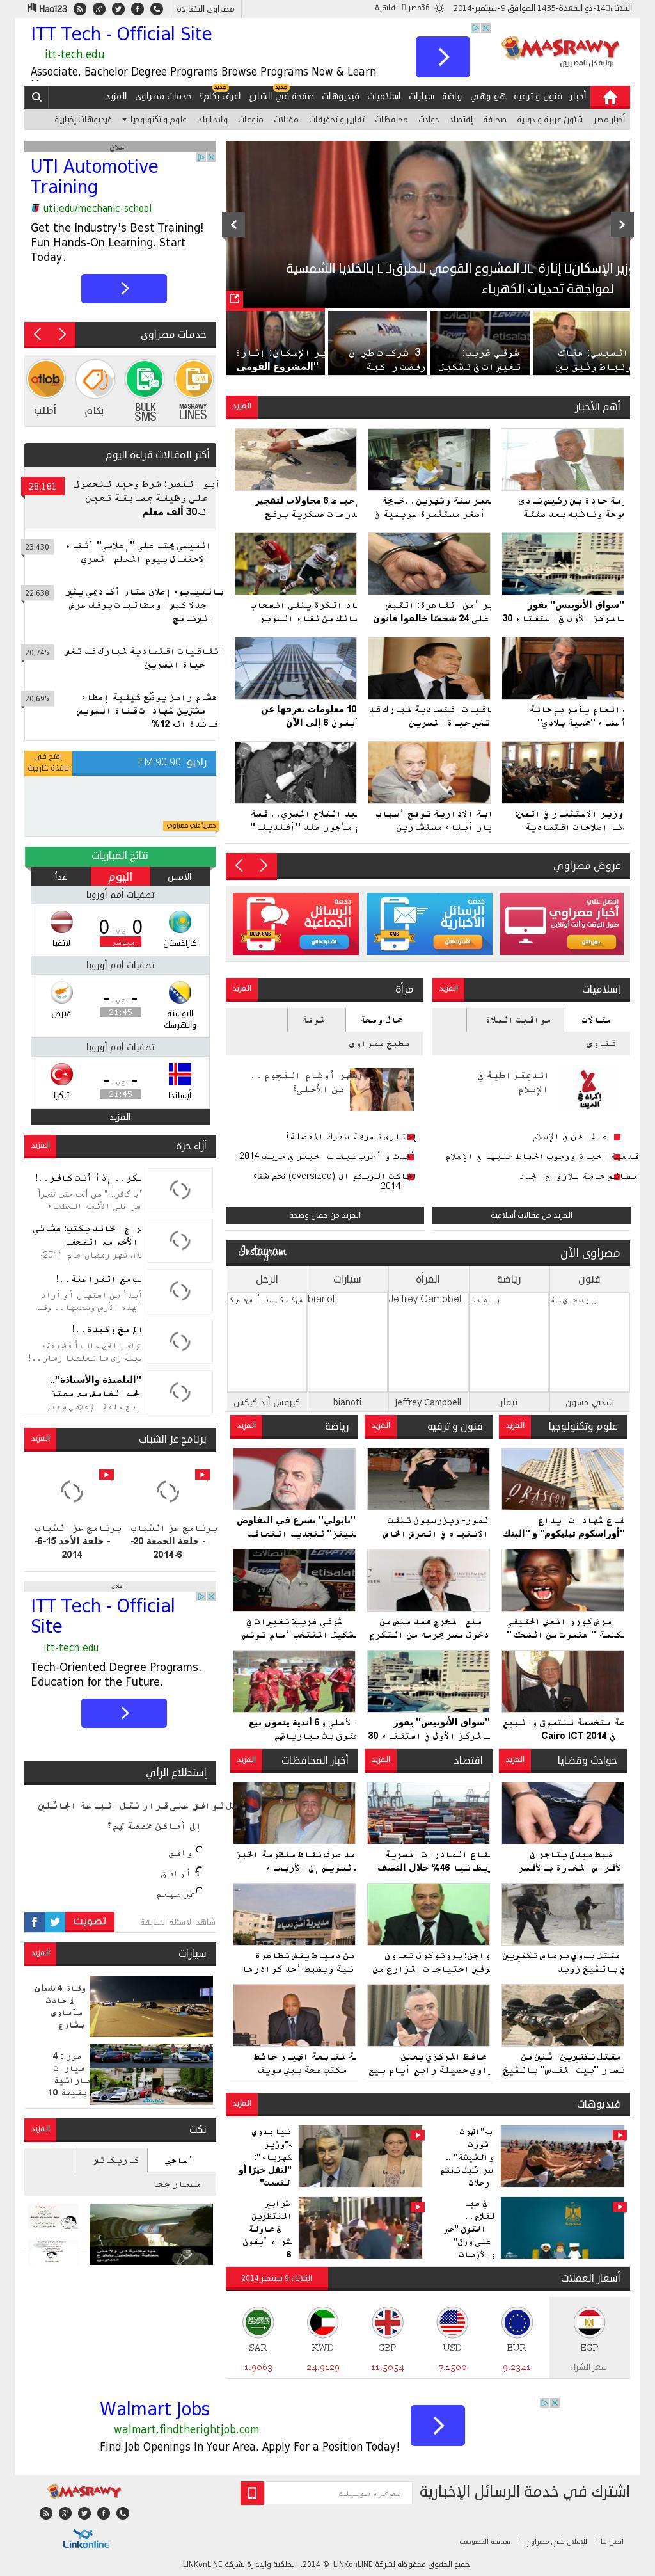 Masrawy at Tuesday Sept. 9, 2014, 6:12 p.m. UTC